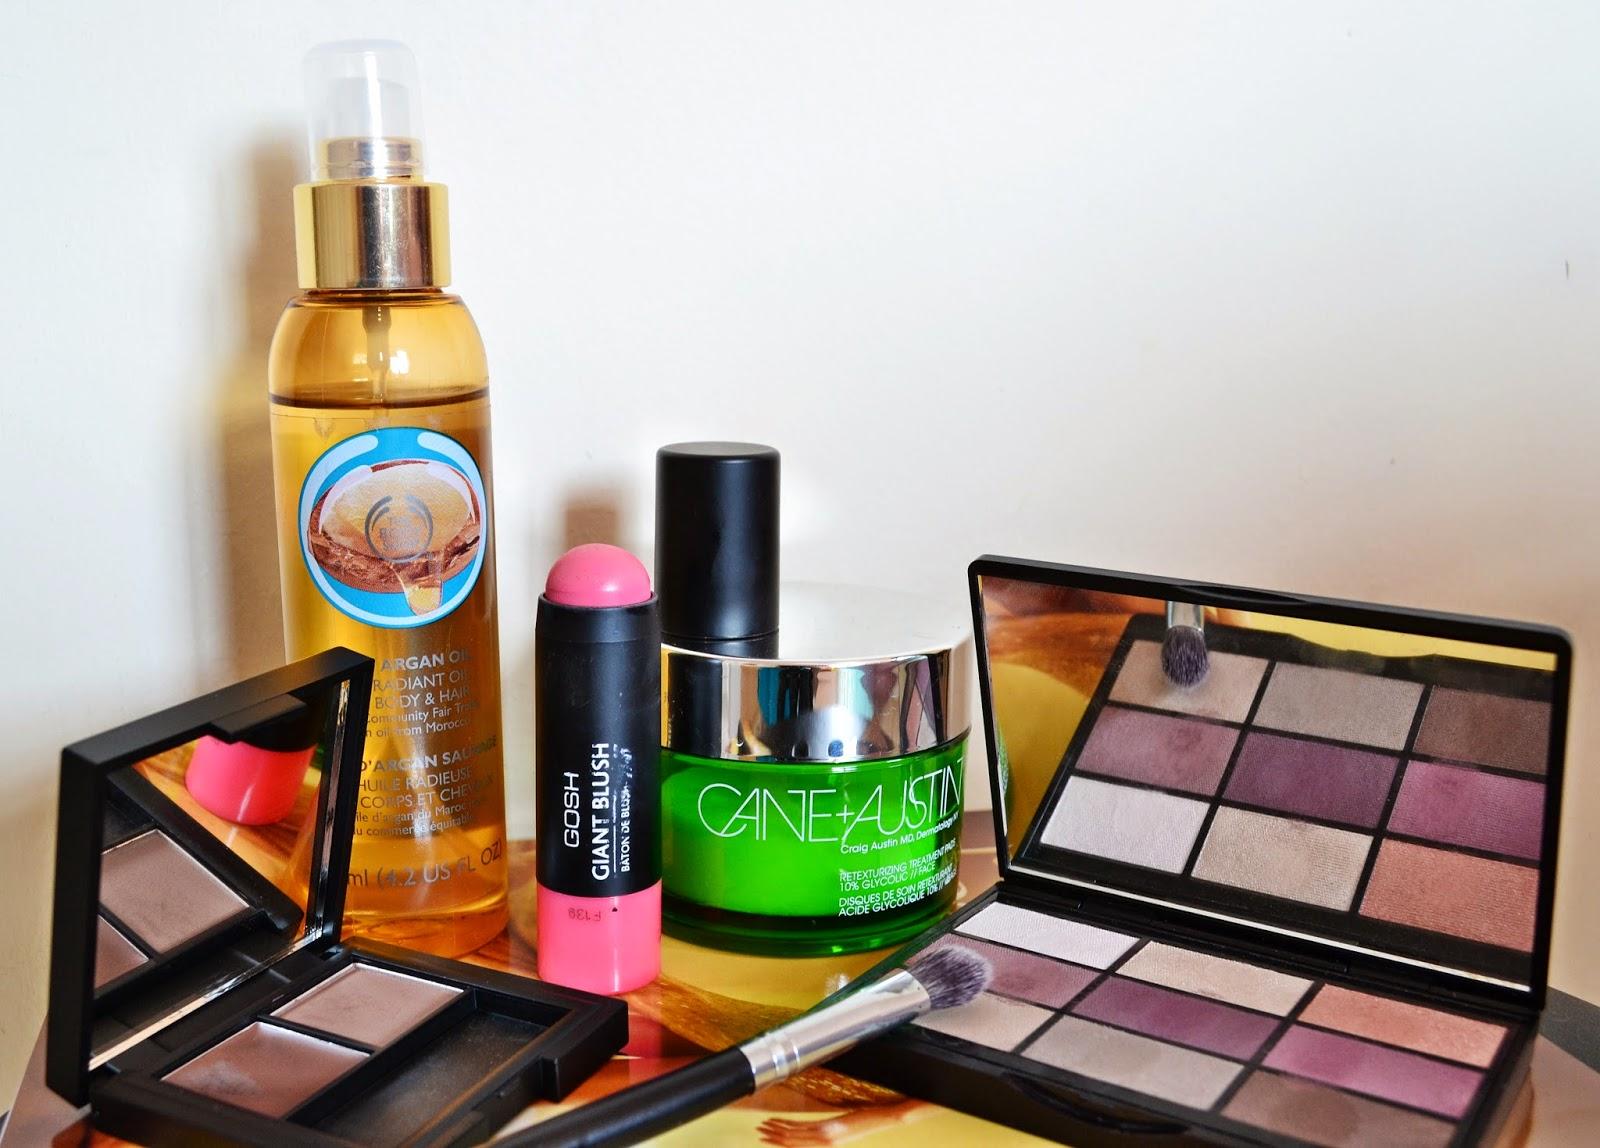 September 2014 Favourites ft. The Body Shop, Sleek MakeUp, GOSH Cosmetics, Cane+Austin & Crown Brush - Aspiring Londoner